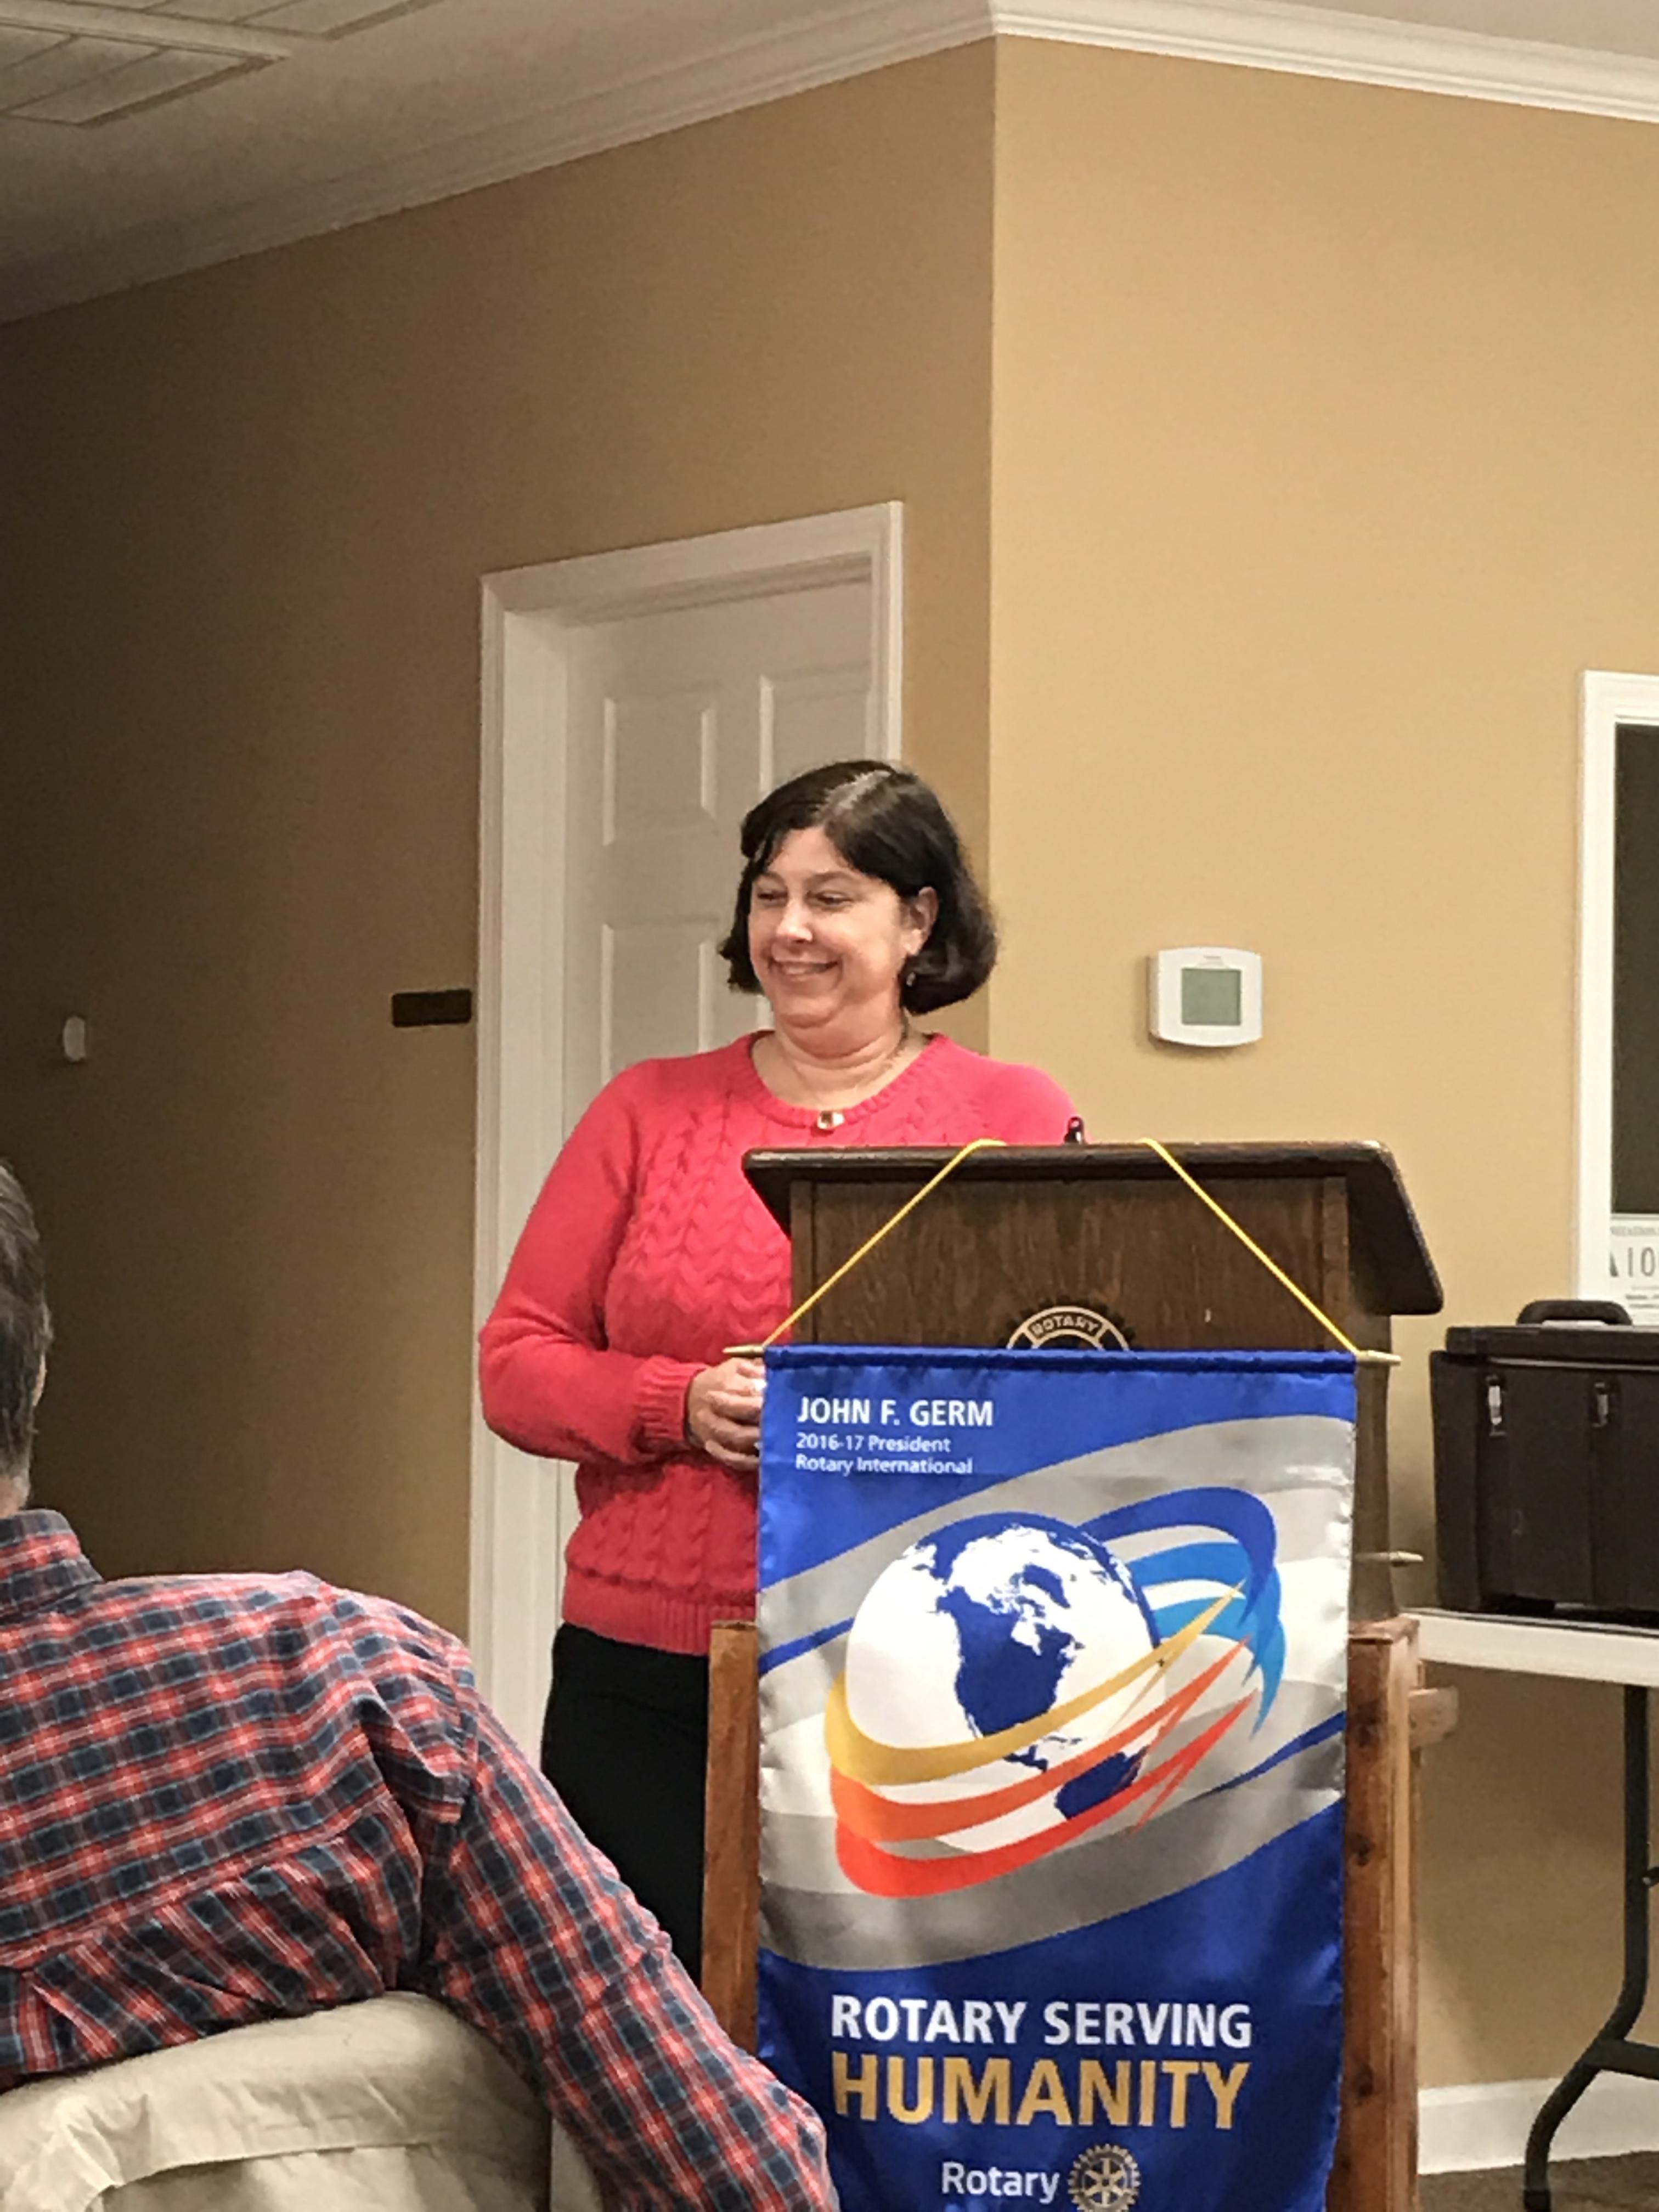 Erin Smith at Bladenboro Rotary meeting